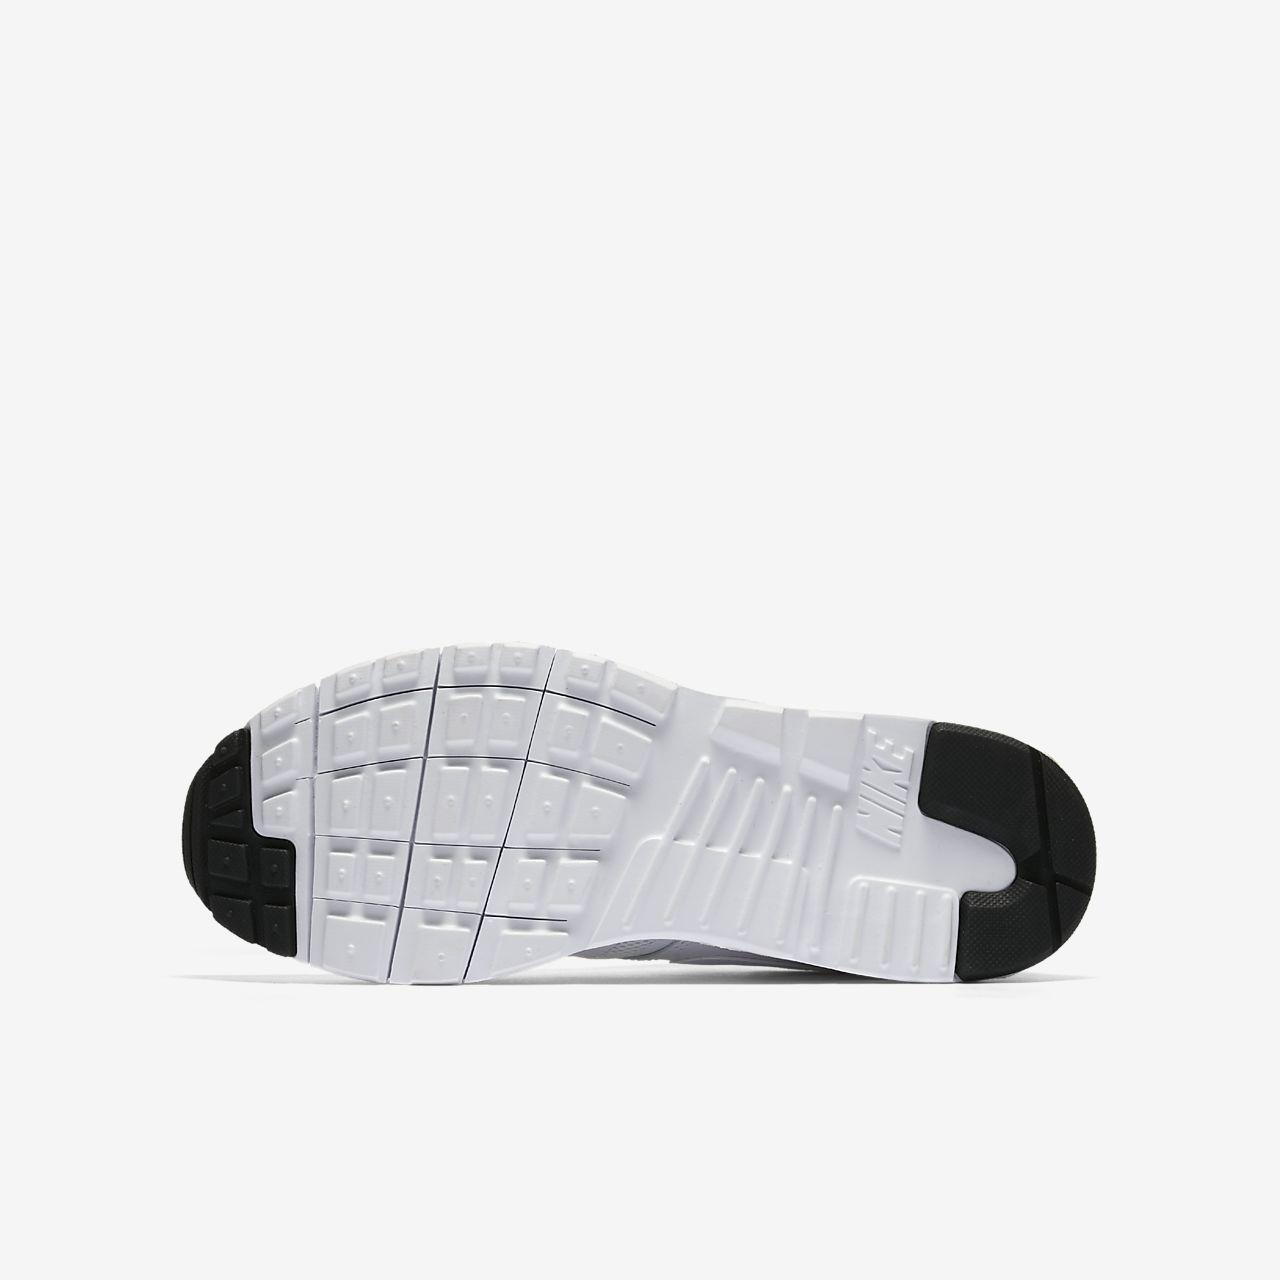 finest selection 66afe 847f3 ... Sko Nike Air Max Vision för ungdom